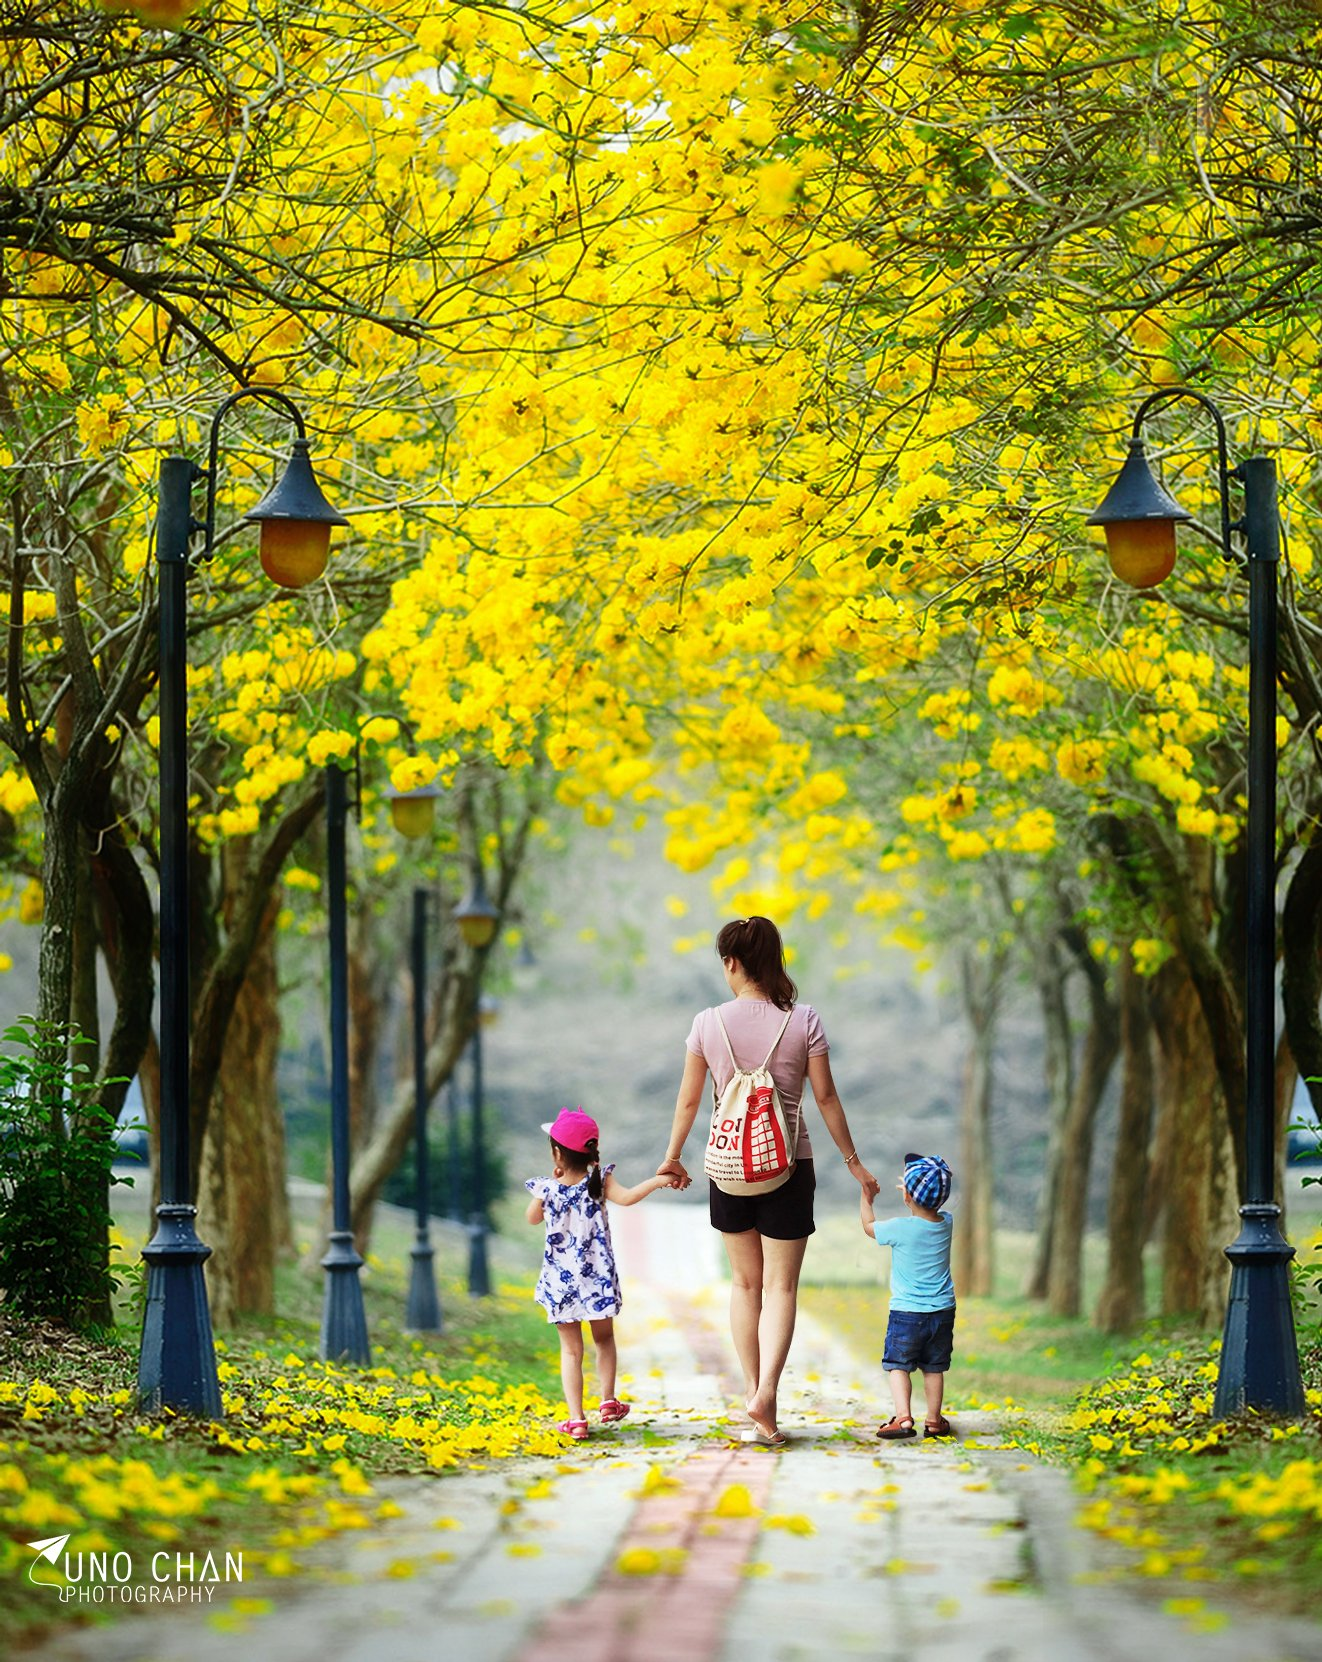 Beauty flower, Hanoi, Unochan, Vietnam, Vuonghongchan, Yellow, unochan